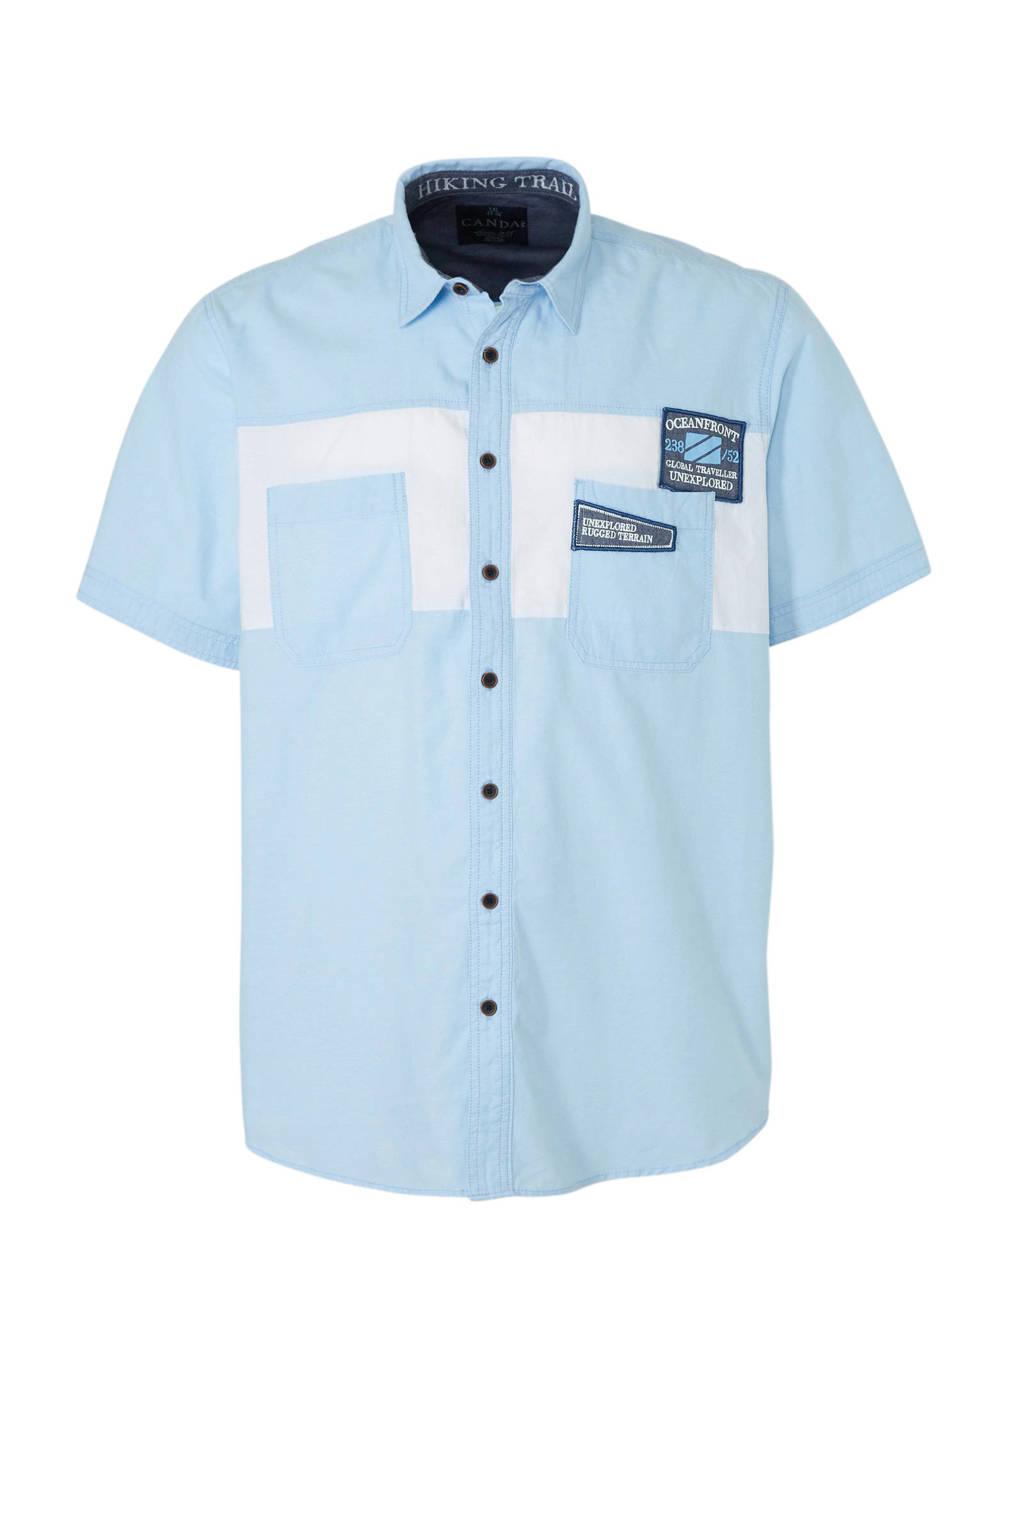 C&A Canda overhemd, Lichtblauw